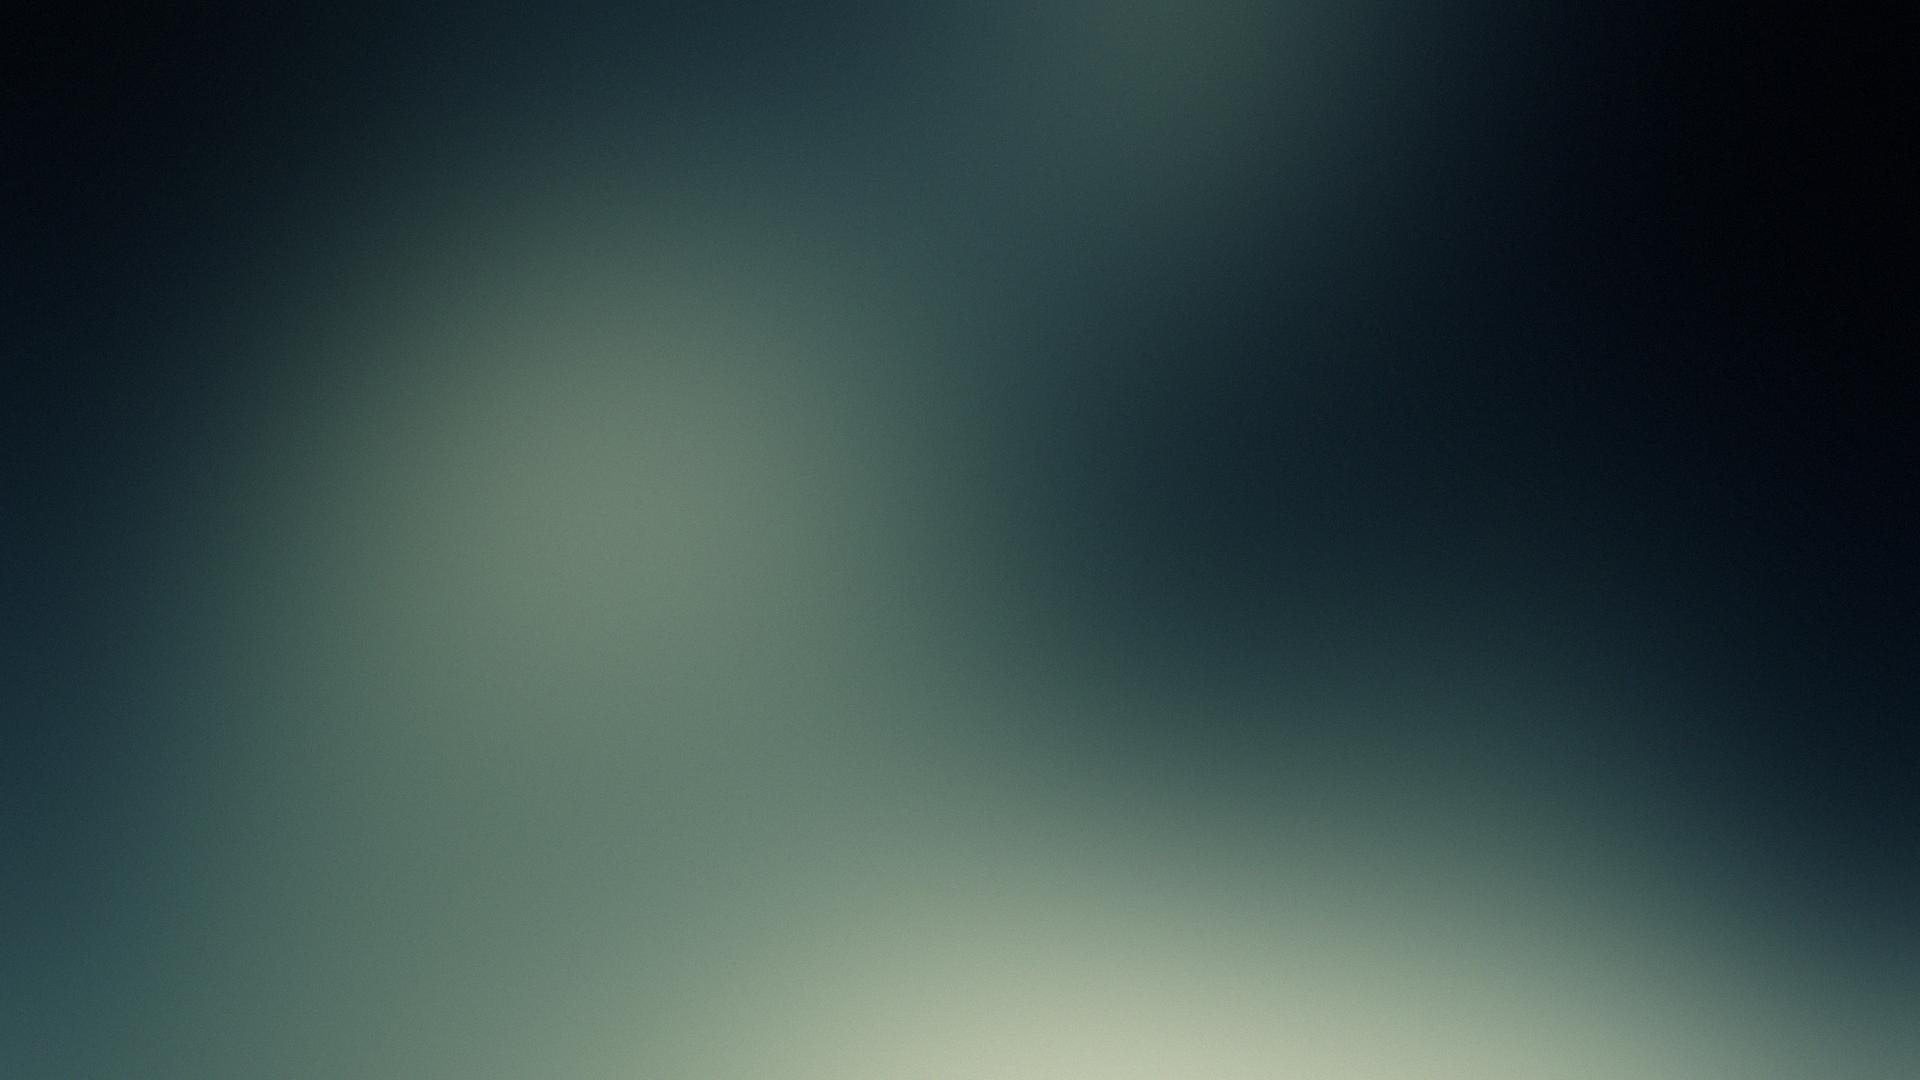 gradient-wallpaper-3.jpg